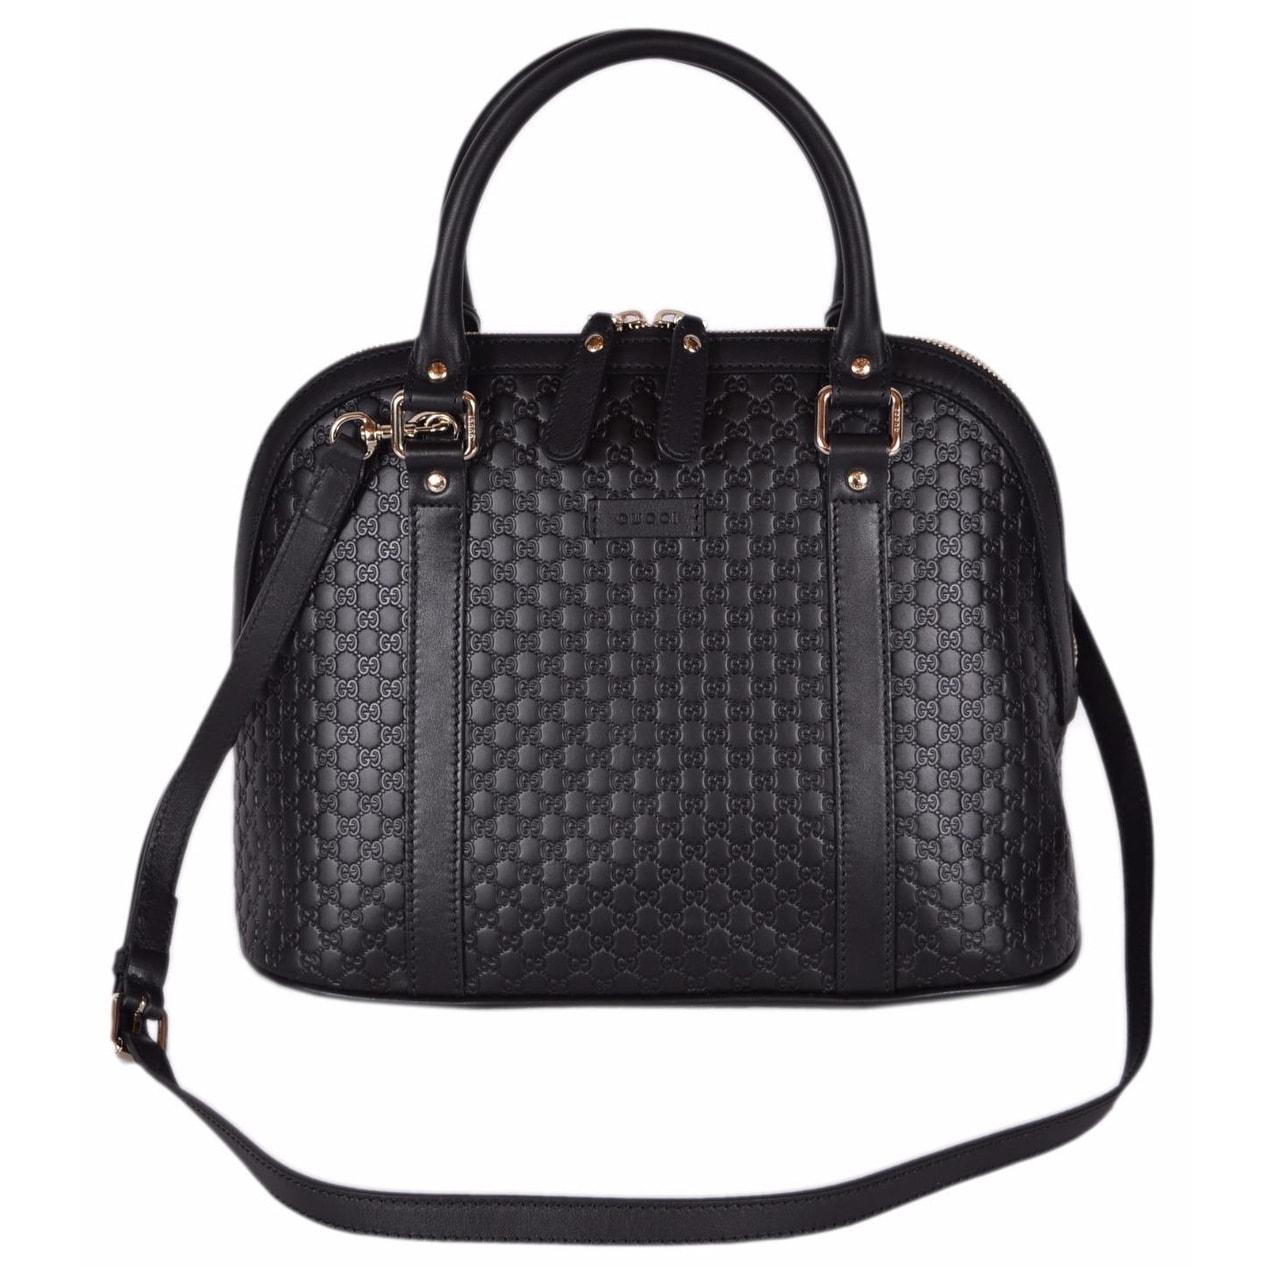 6d7a1ed76 Gucci 449663 Black Leather Medium Convertible Micro GG Dome Satchel Purse -  12